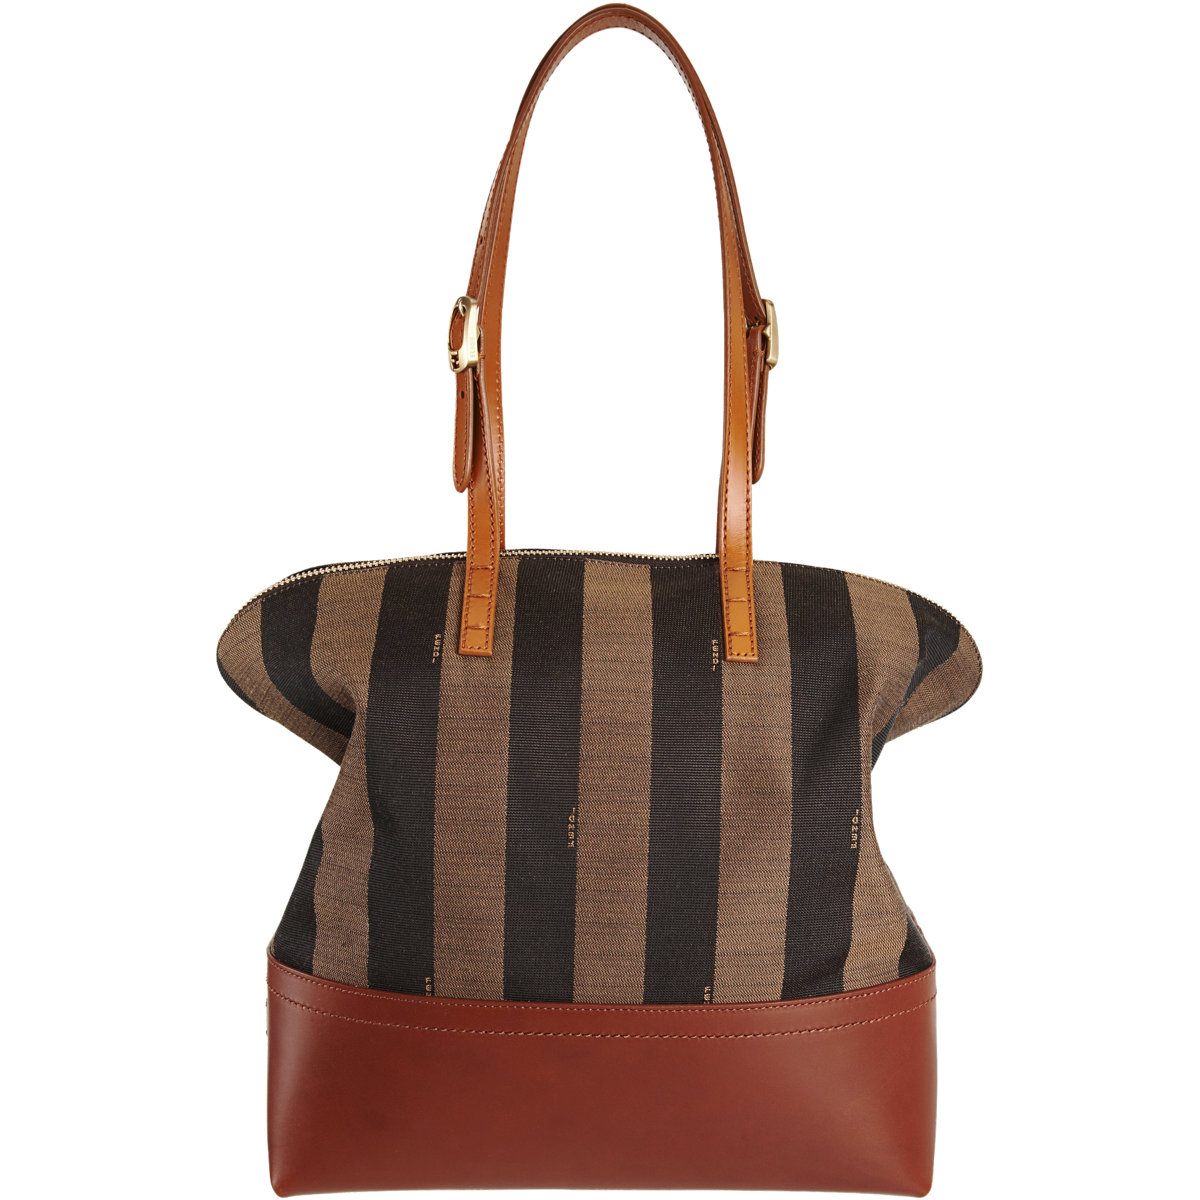 2649b78a76 ... Thin Striped Fendi Handbags: Fendi Pequin Stripe 2Bag In Brown